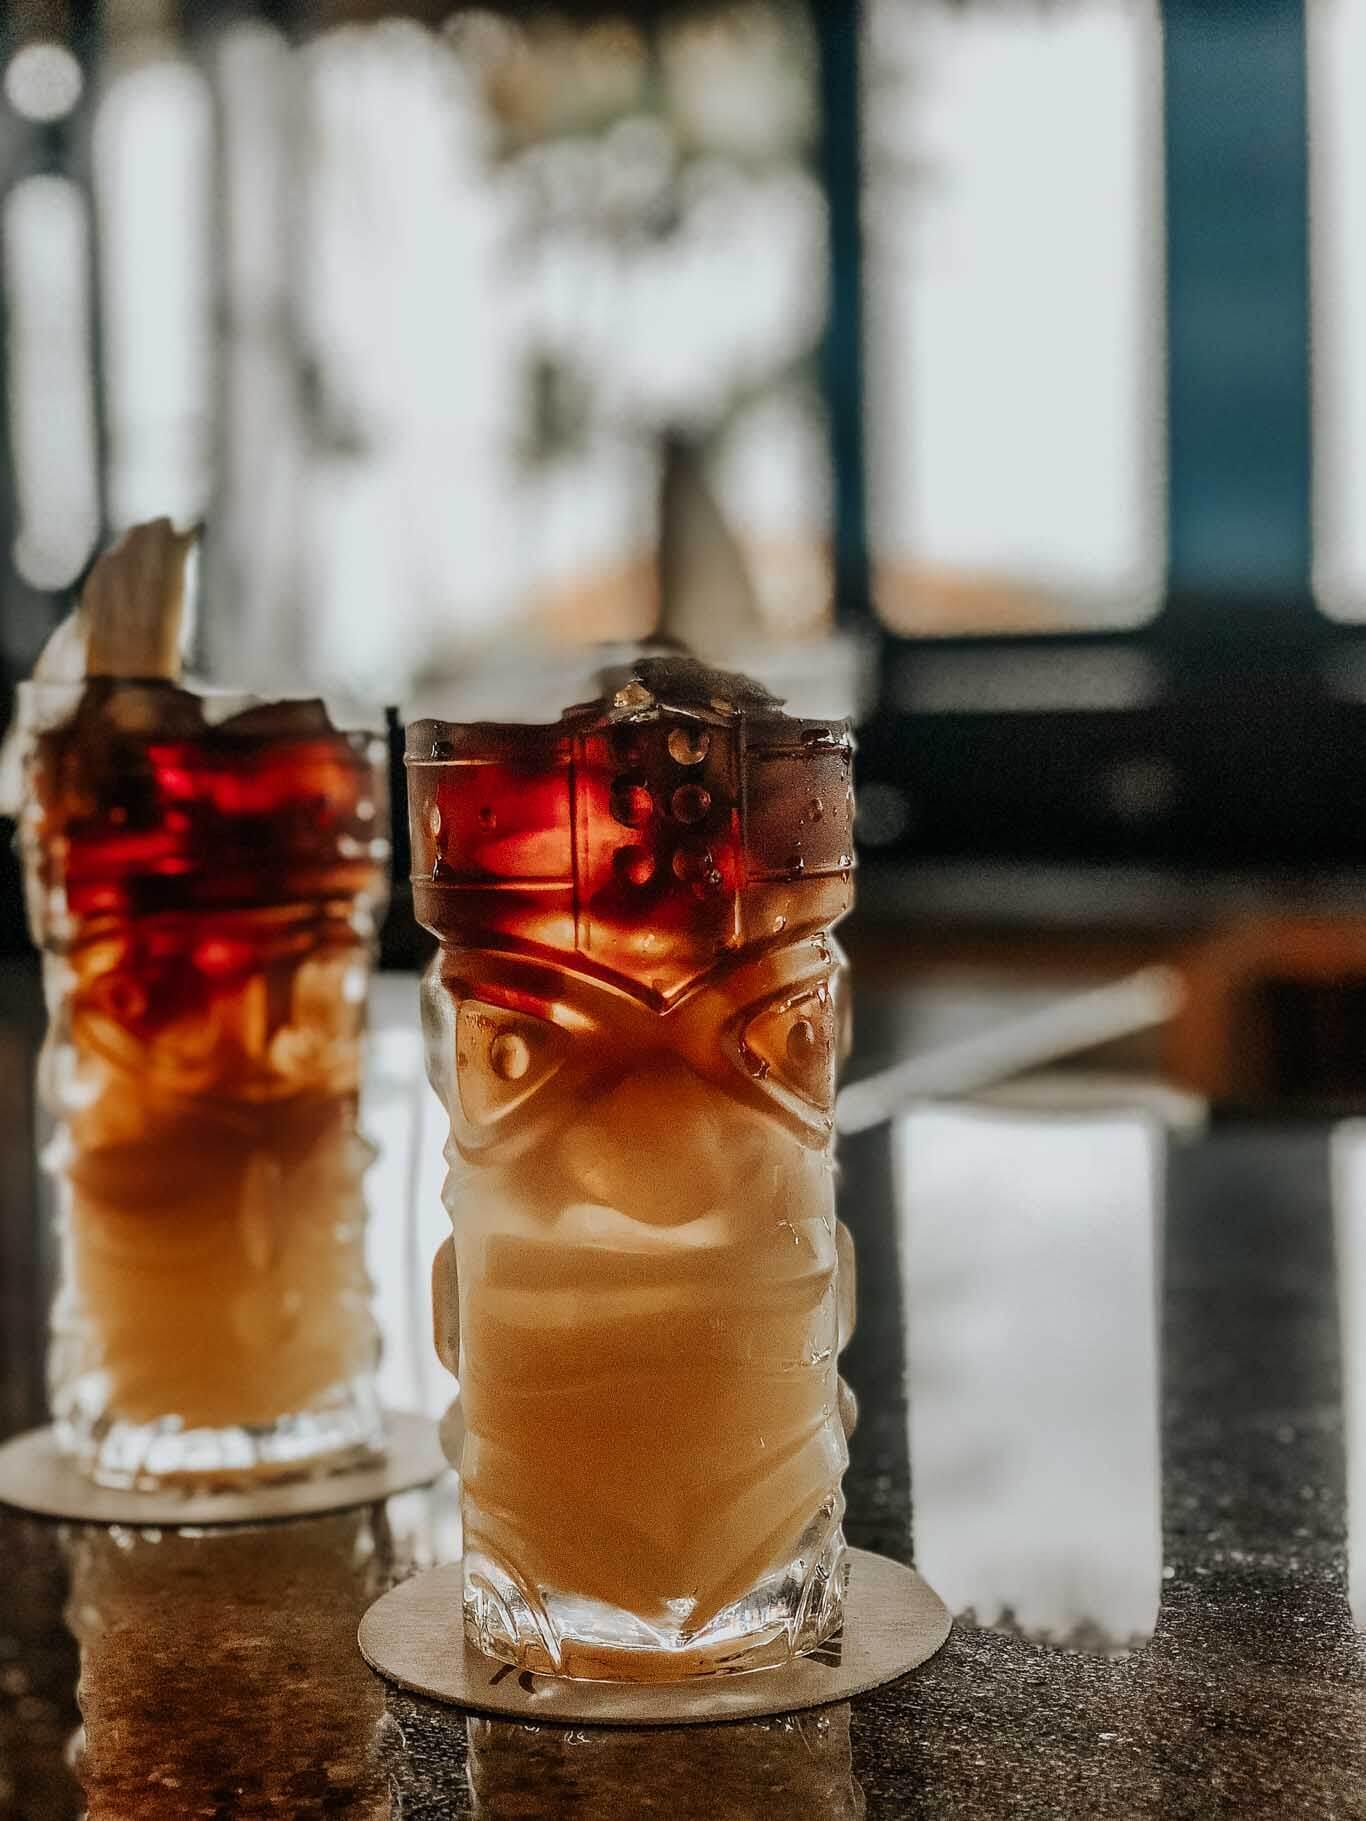 Drinks at Tidepools in Kauai